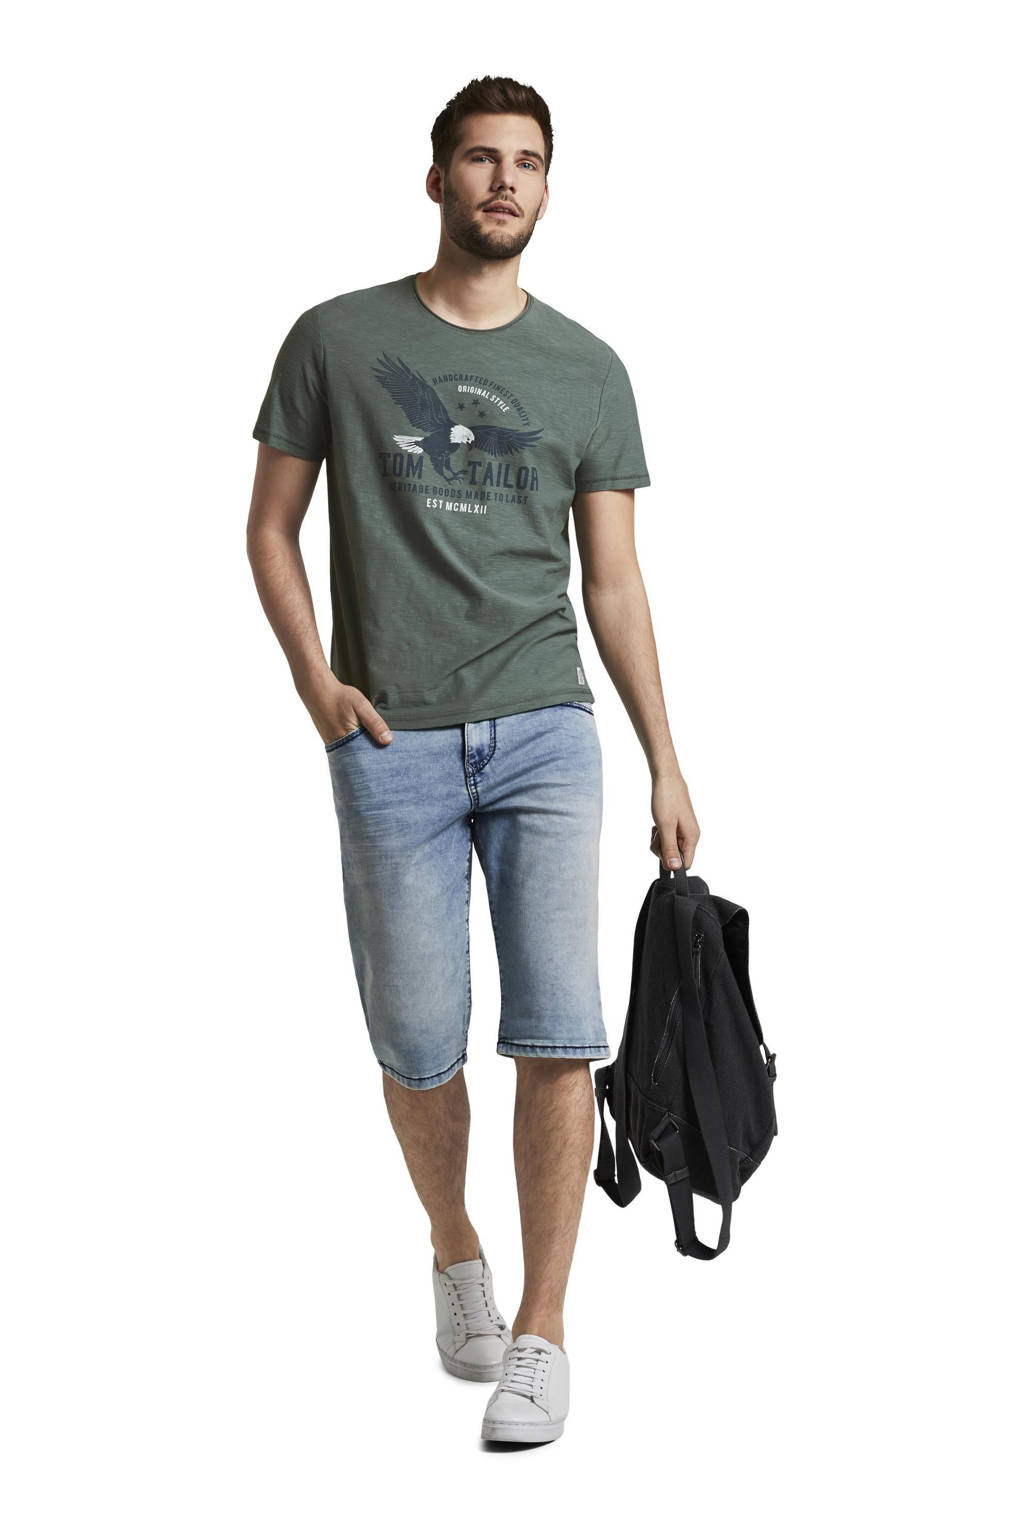 Tom Tailor T-shirt met logo grijsgroen, Grijsgroen